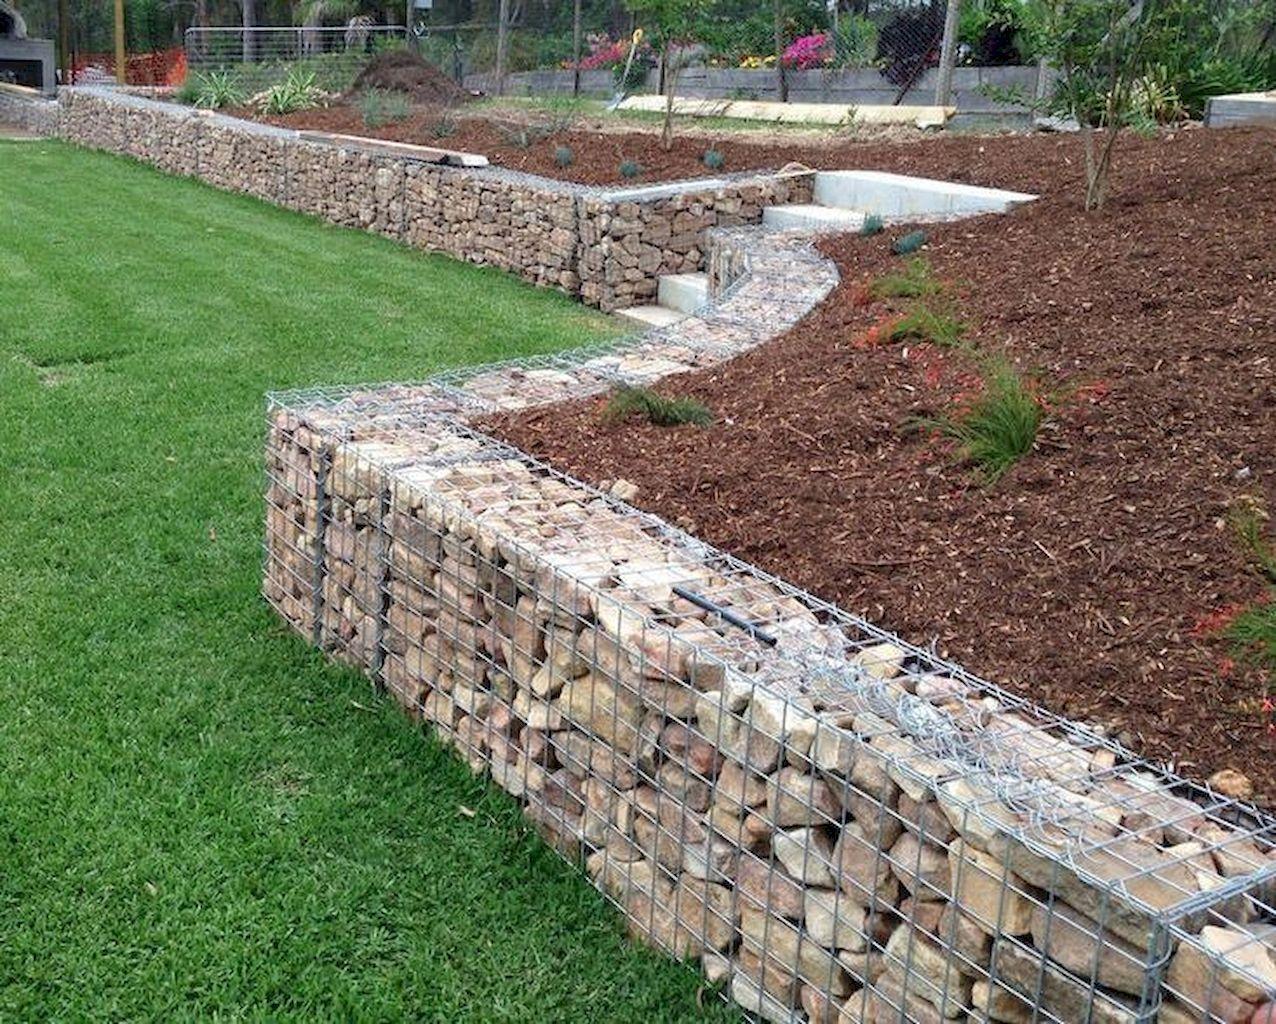 75 Fabulous Gabion Ideas For Your Garden Outdoor Area 400 x 300